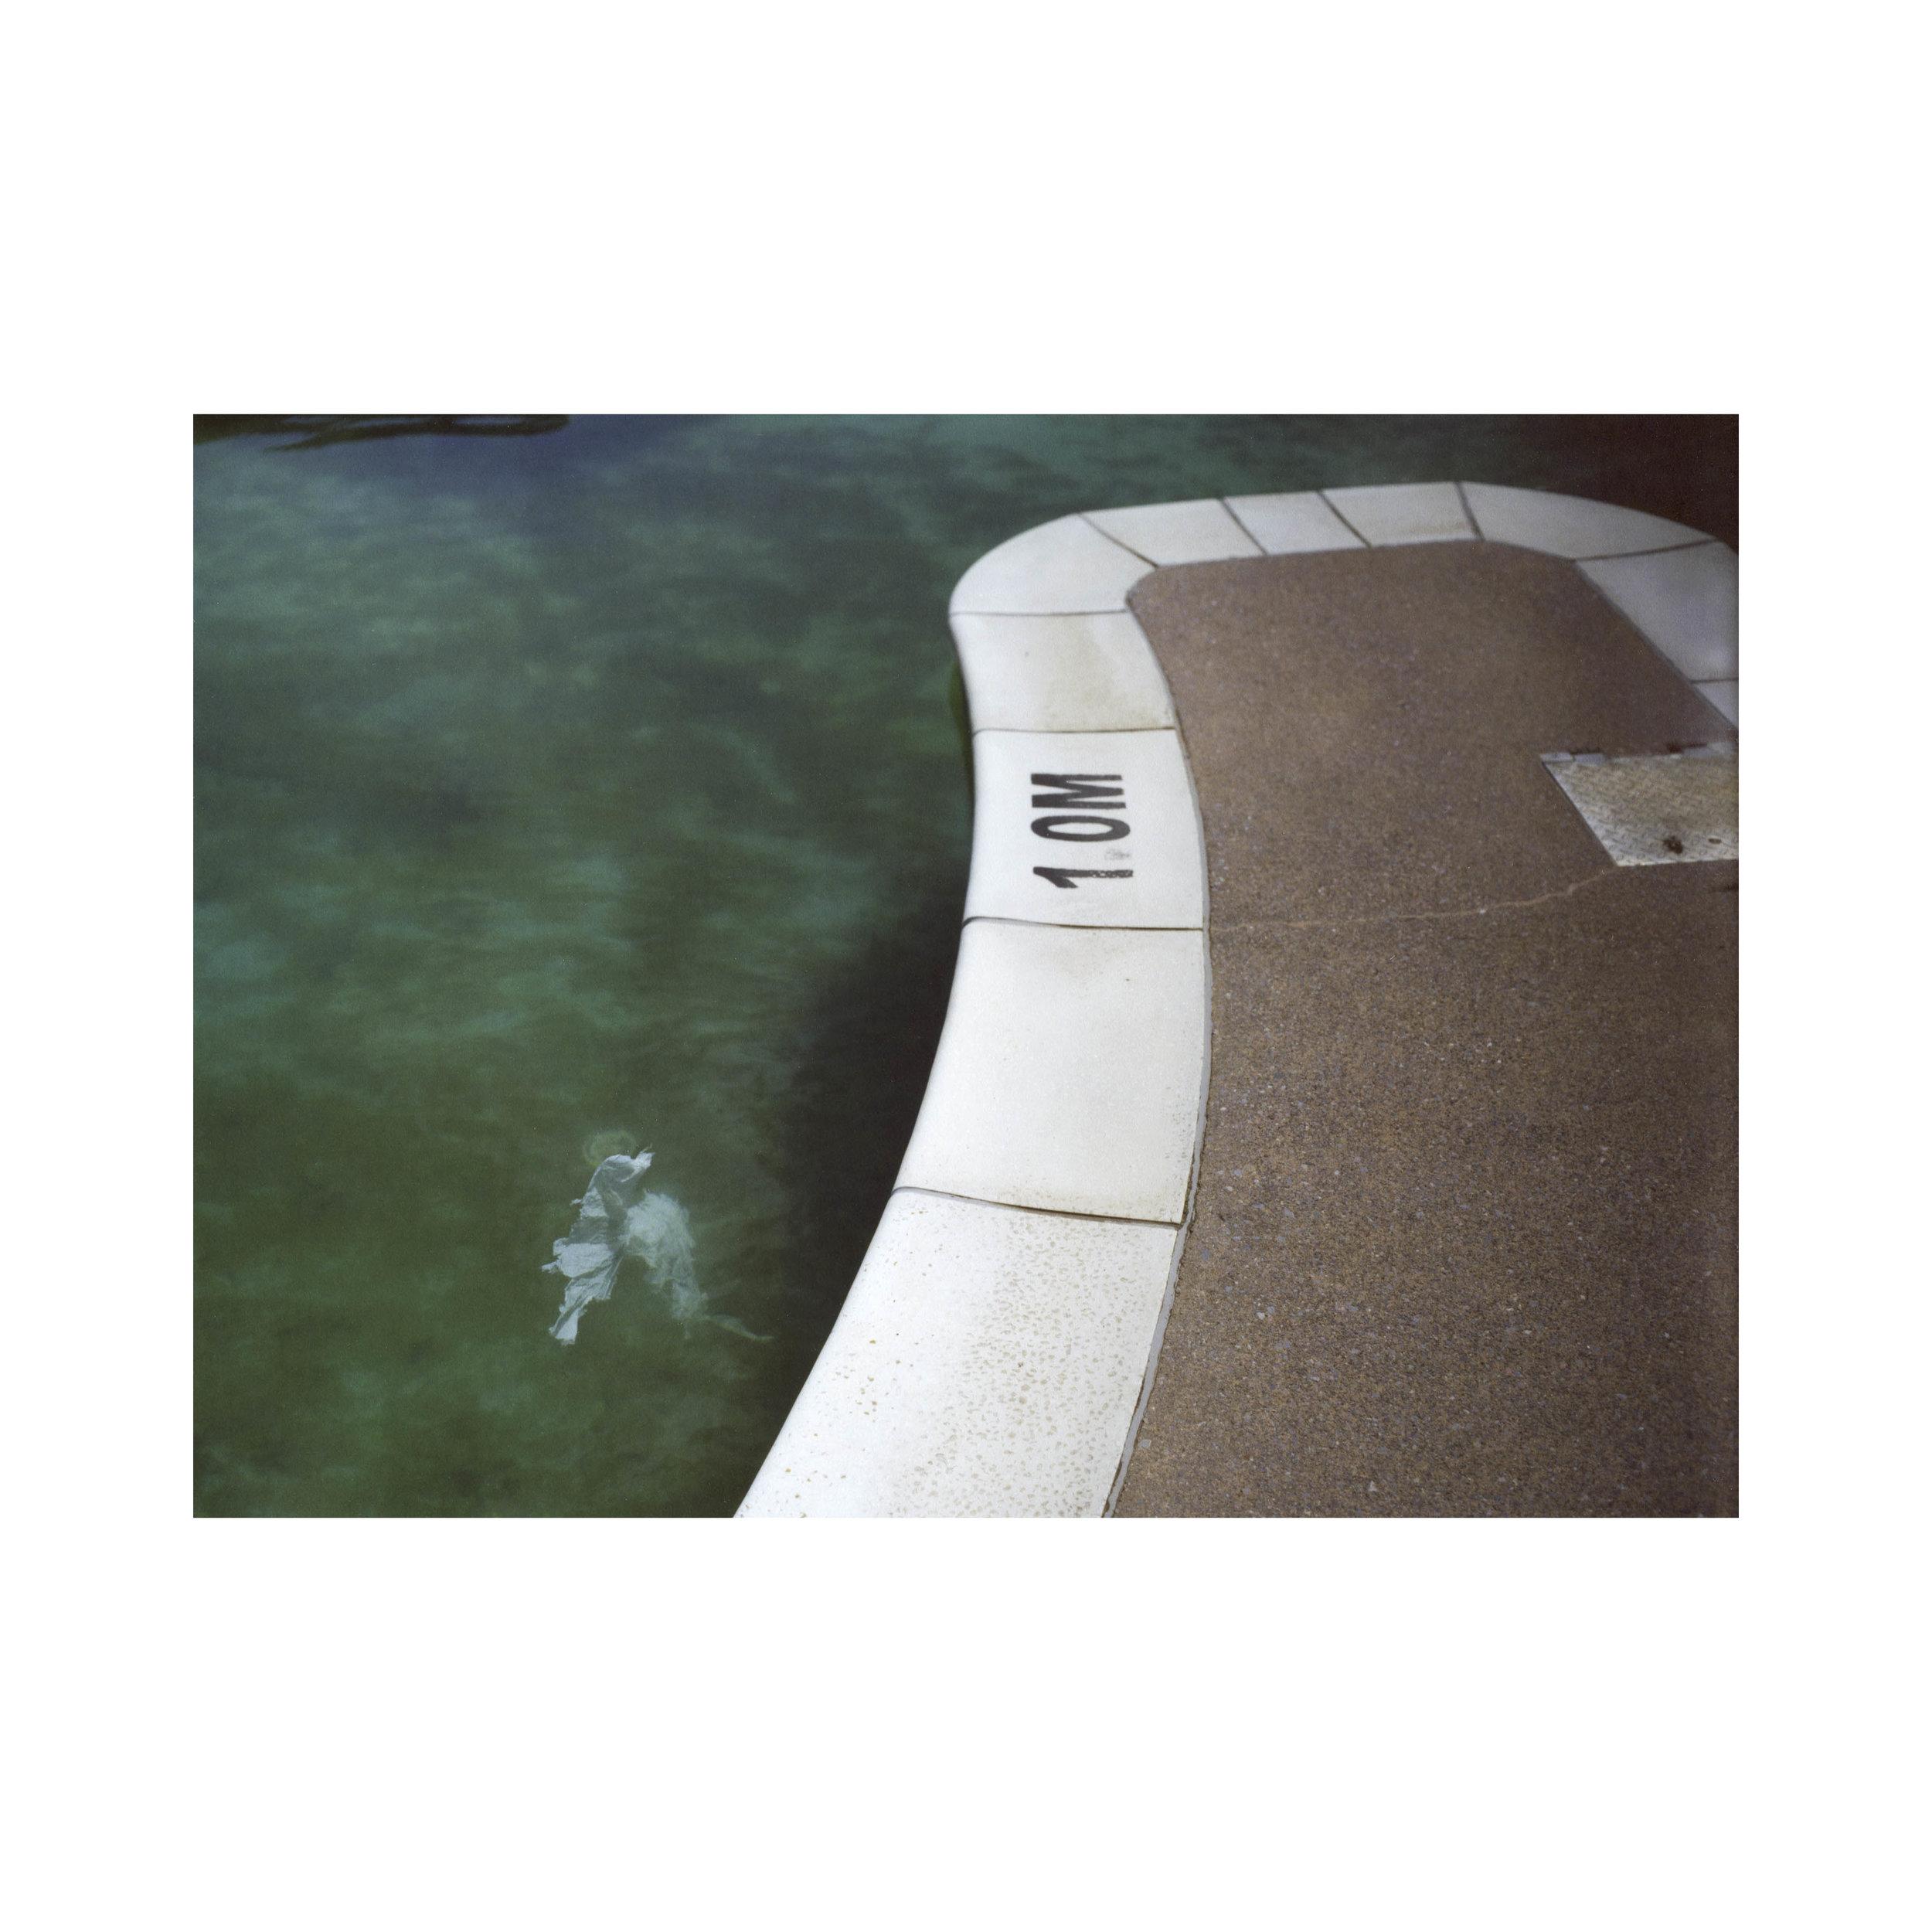 Square Watermarked-011.jpg